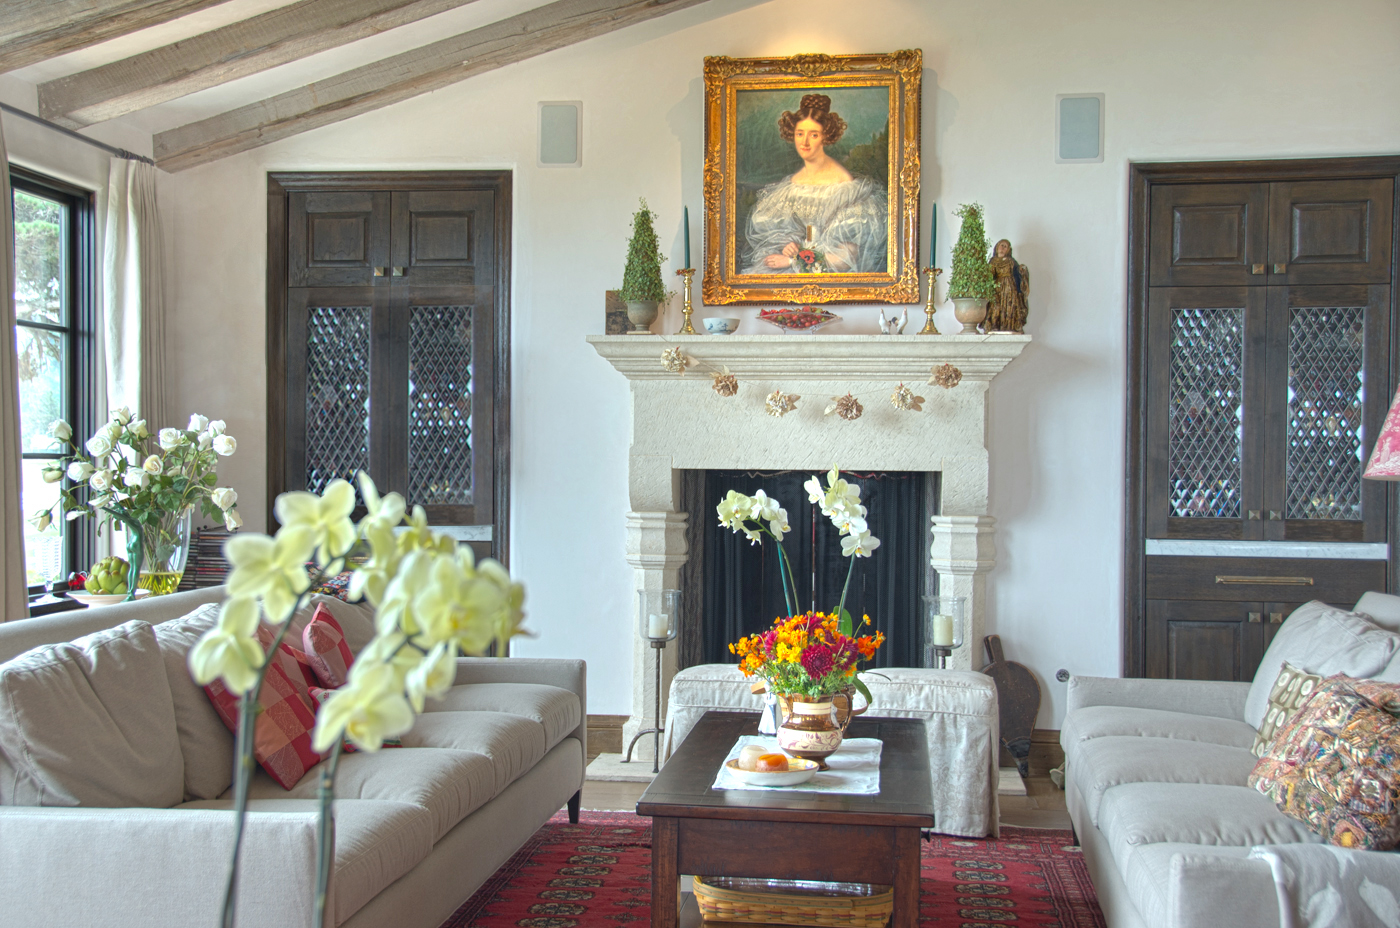 Posey Residence - 2 Living Room Fireplace.jpg